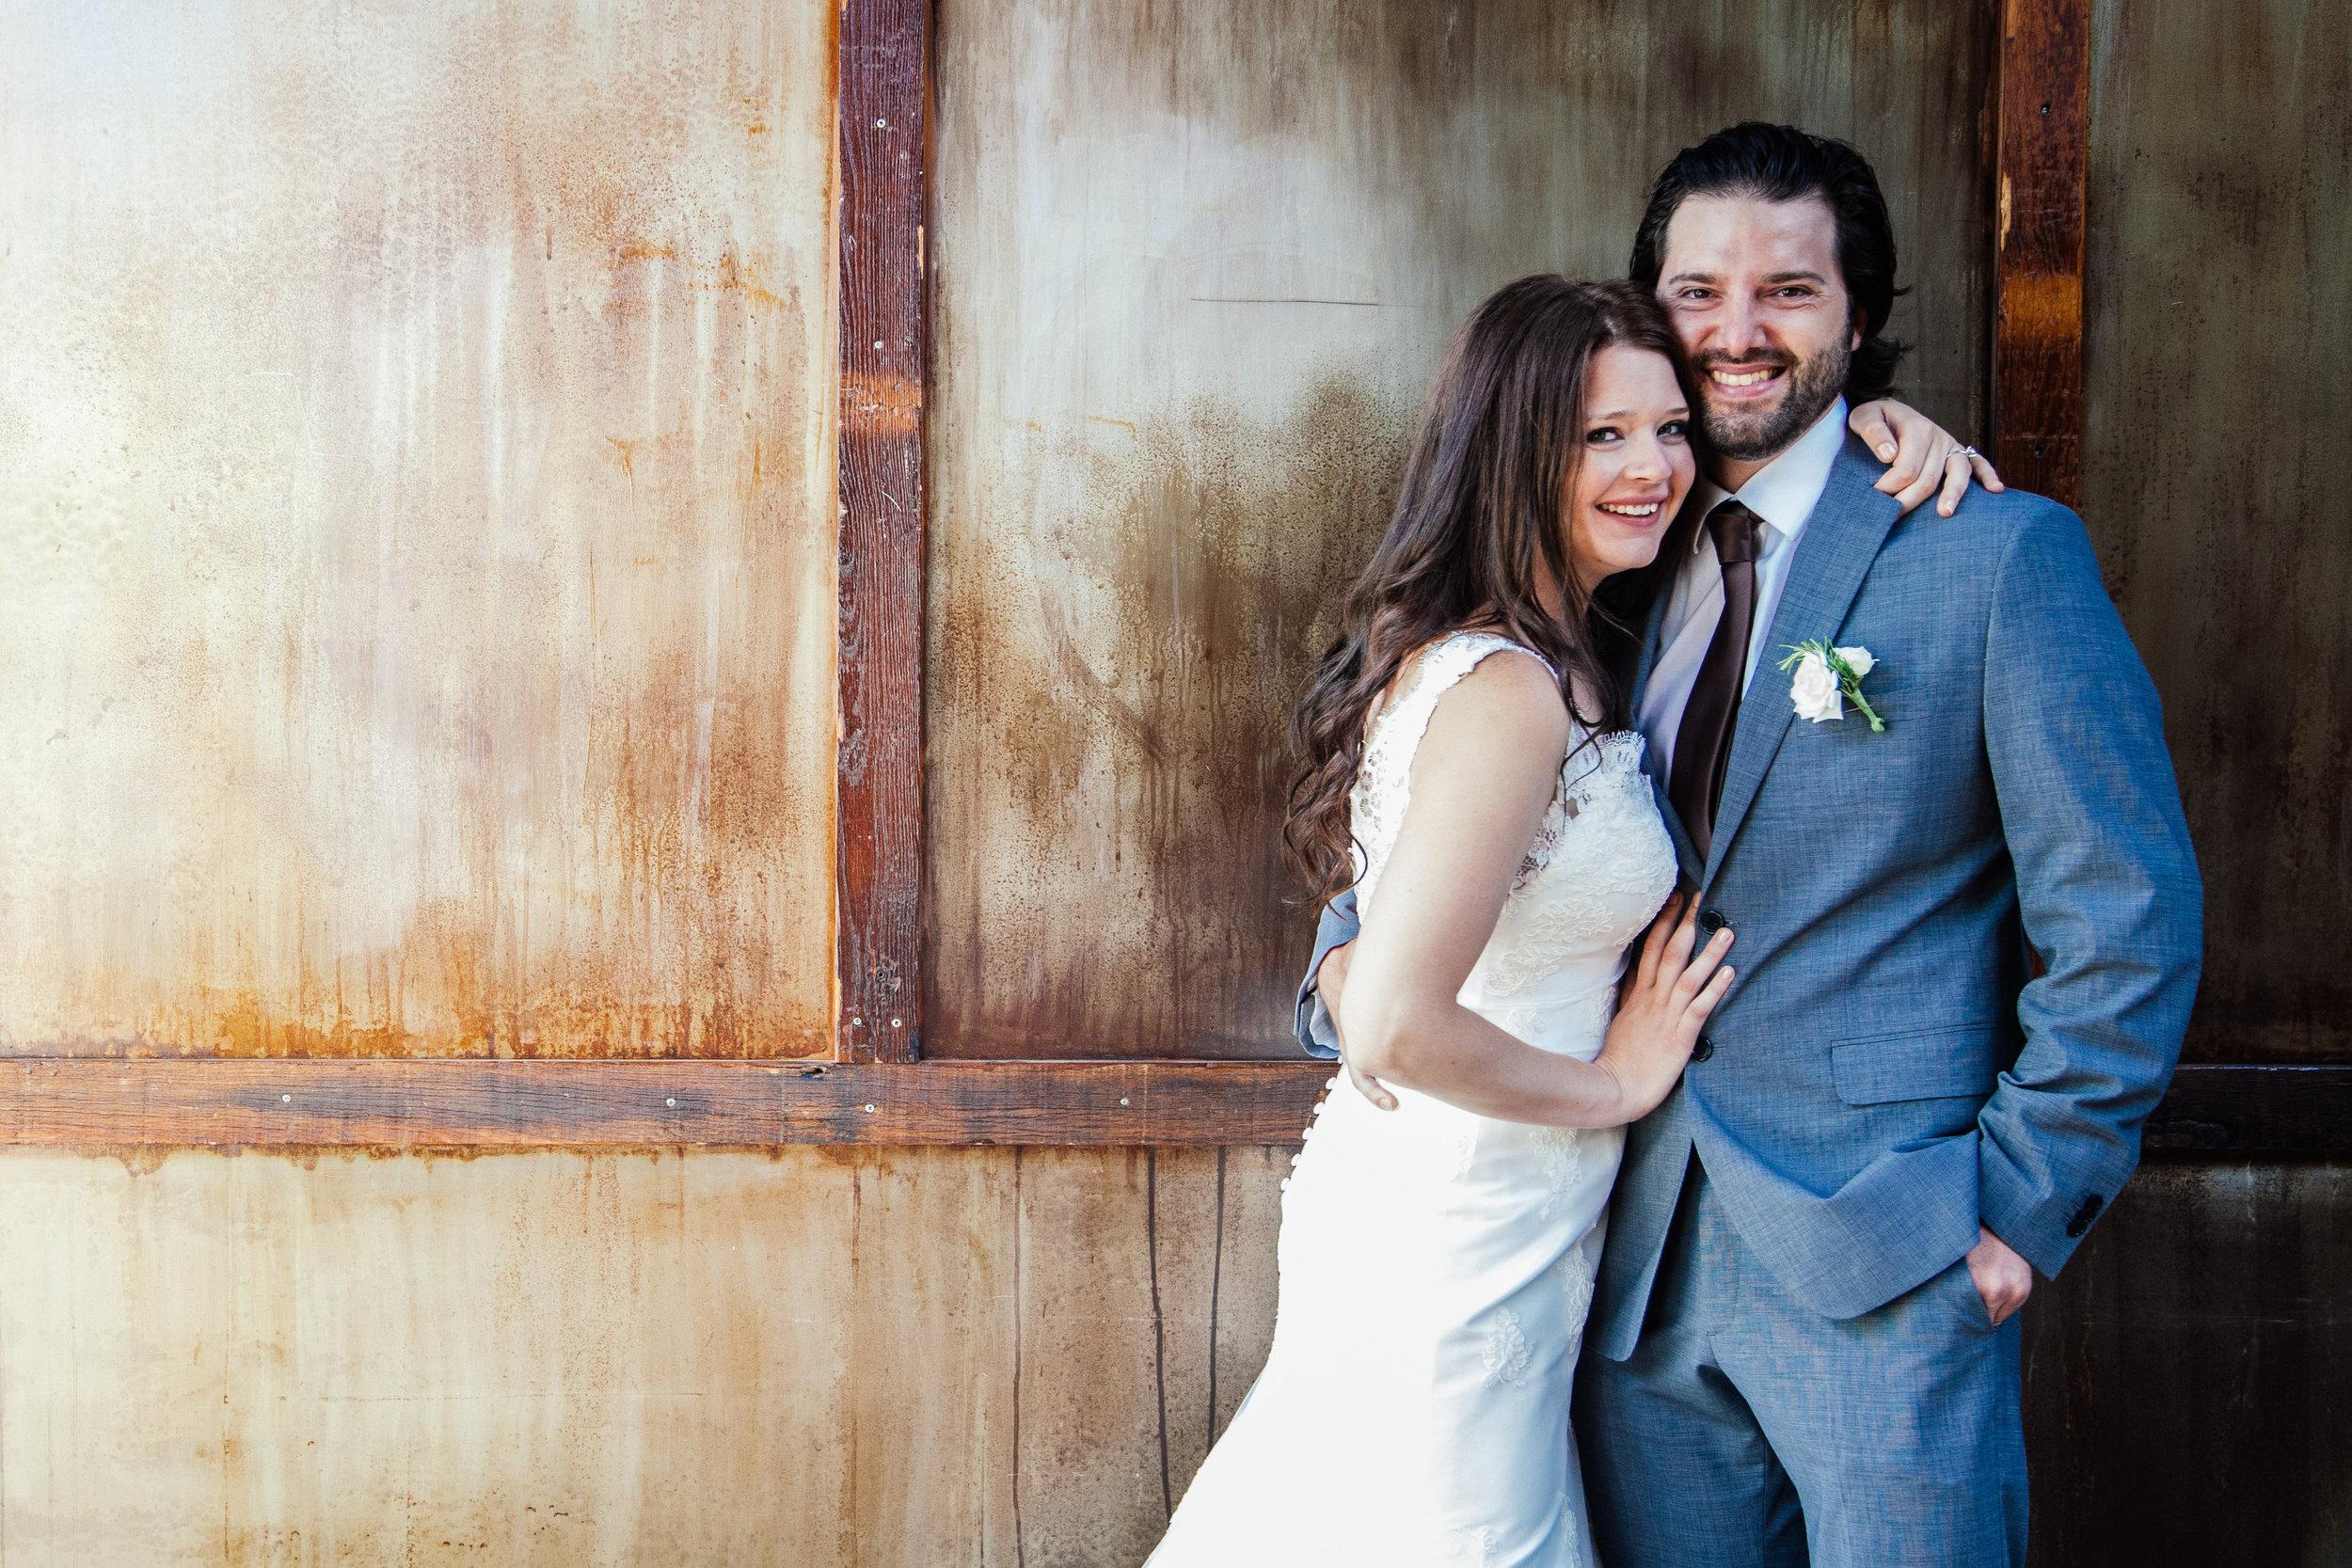 Taryn and Jud s Wedding-Photographers Favorites-0042.jpg